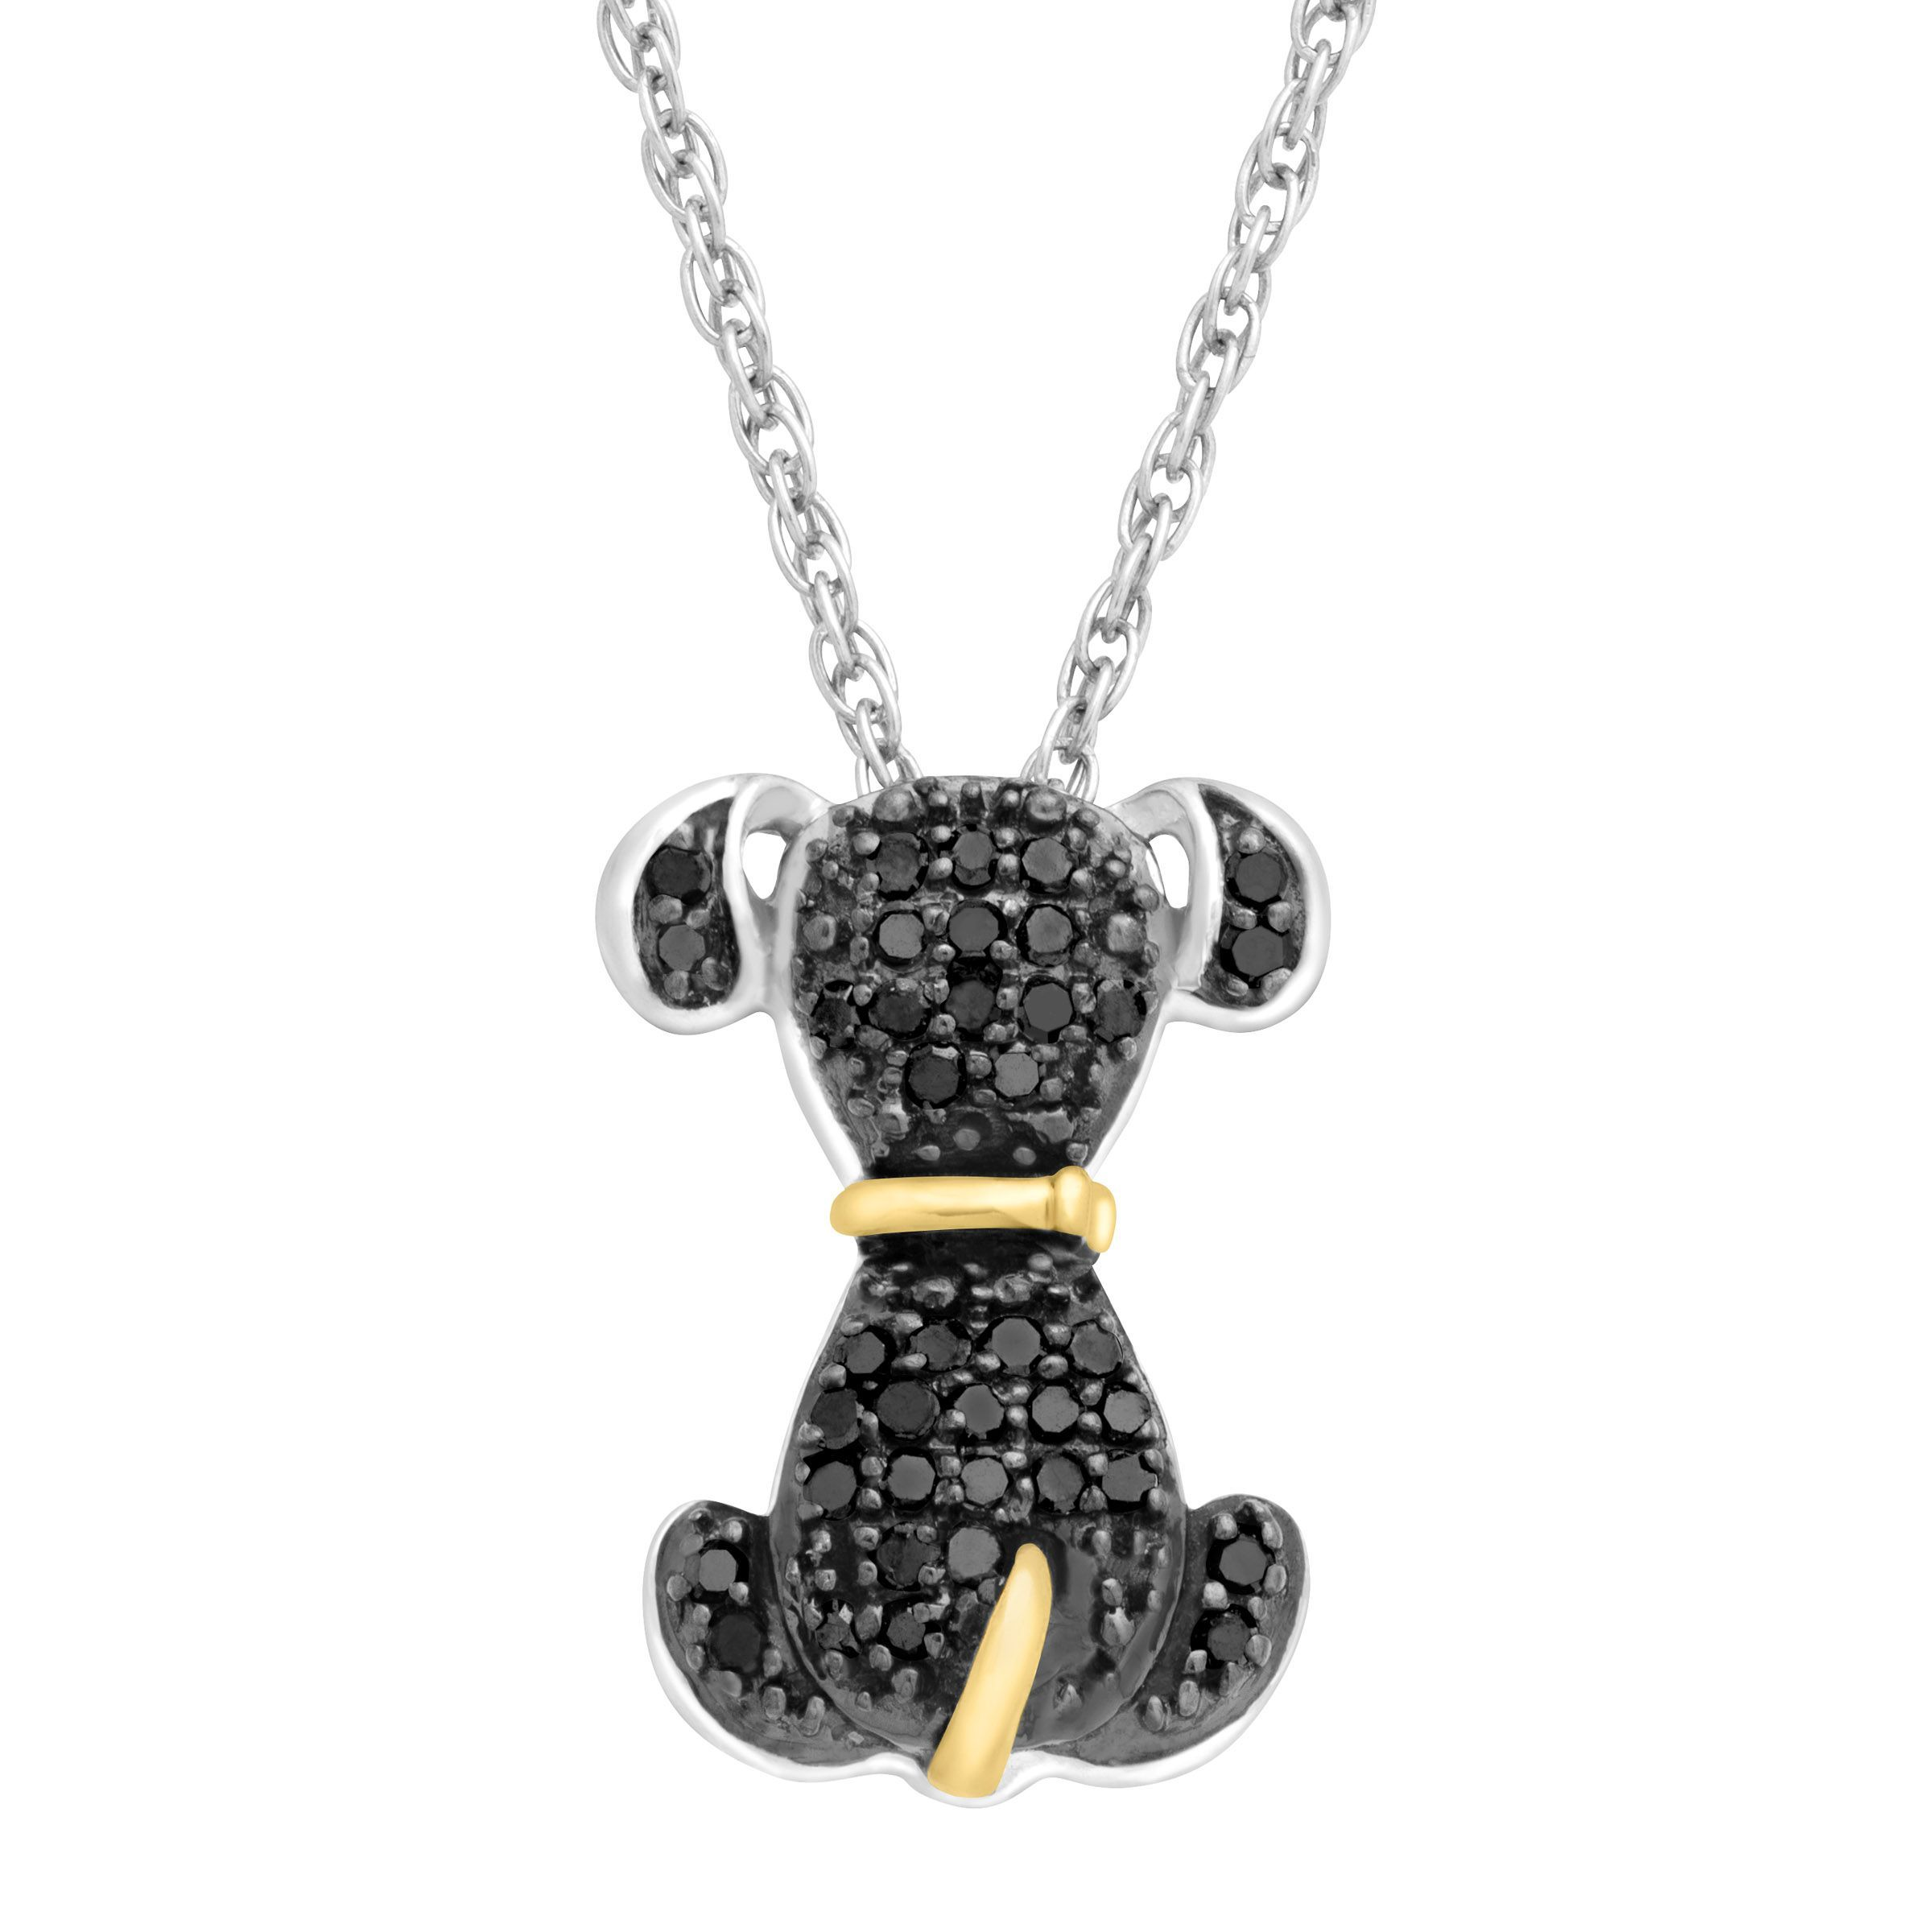 2b5d9405556 Dog Diamond Necklace - Necklace Wallpaper Gallerychitrak.Org